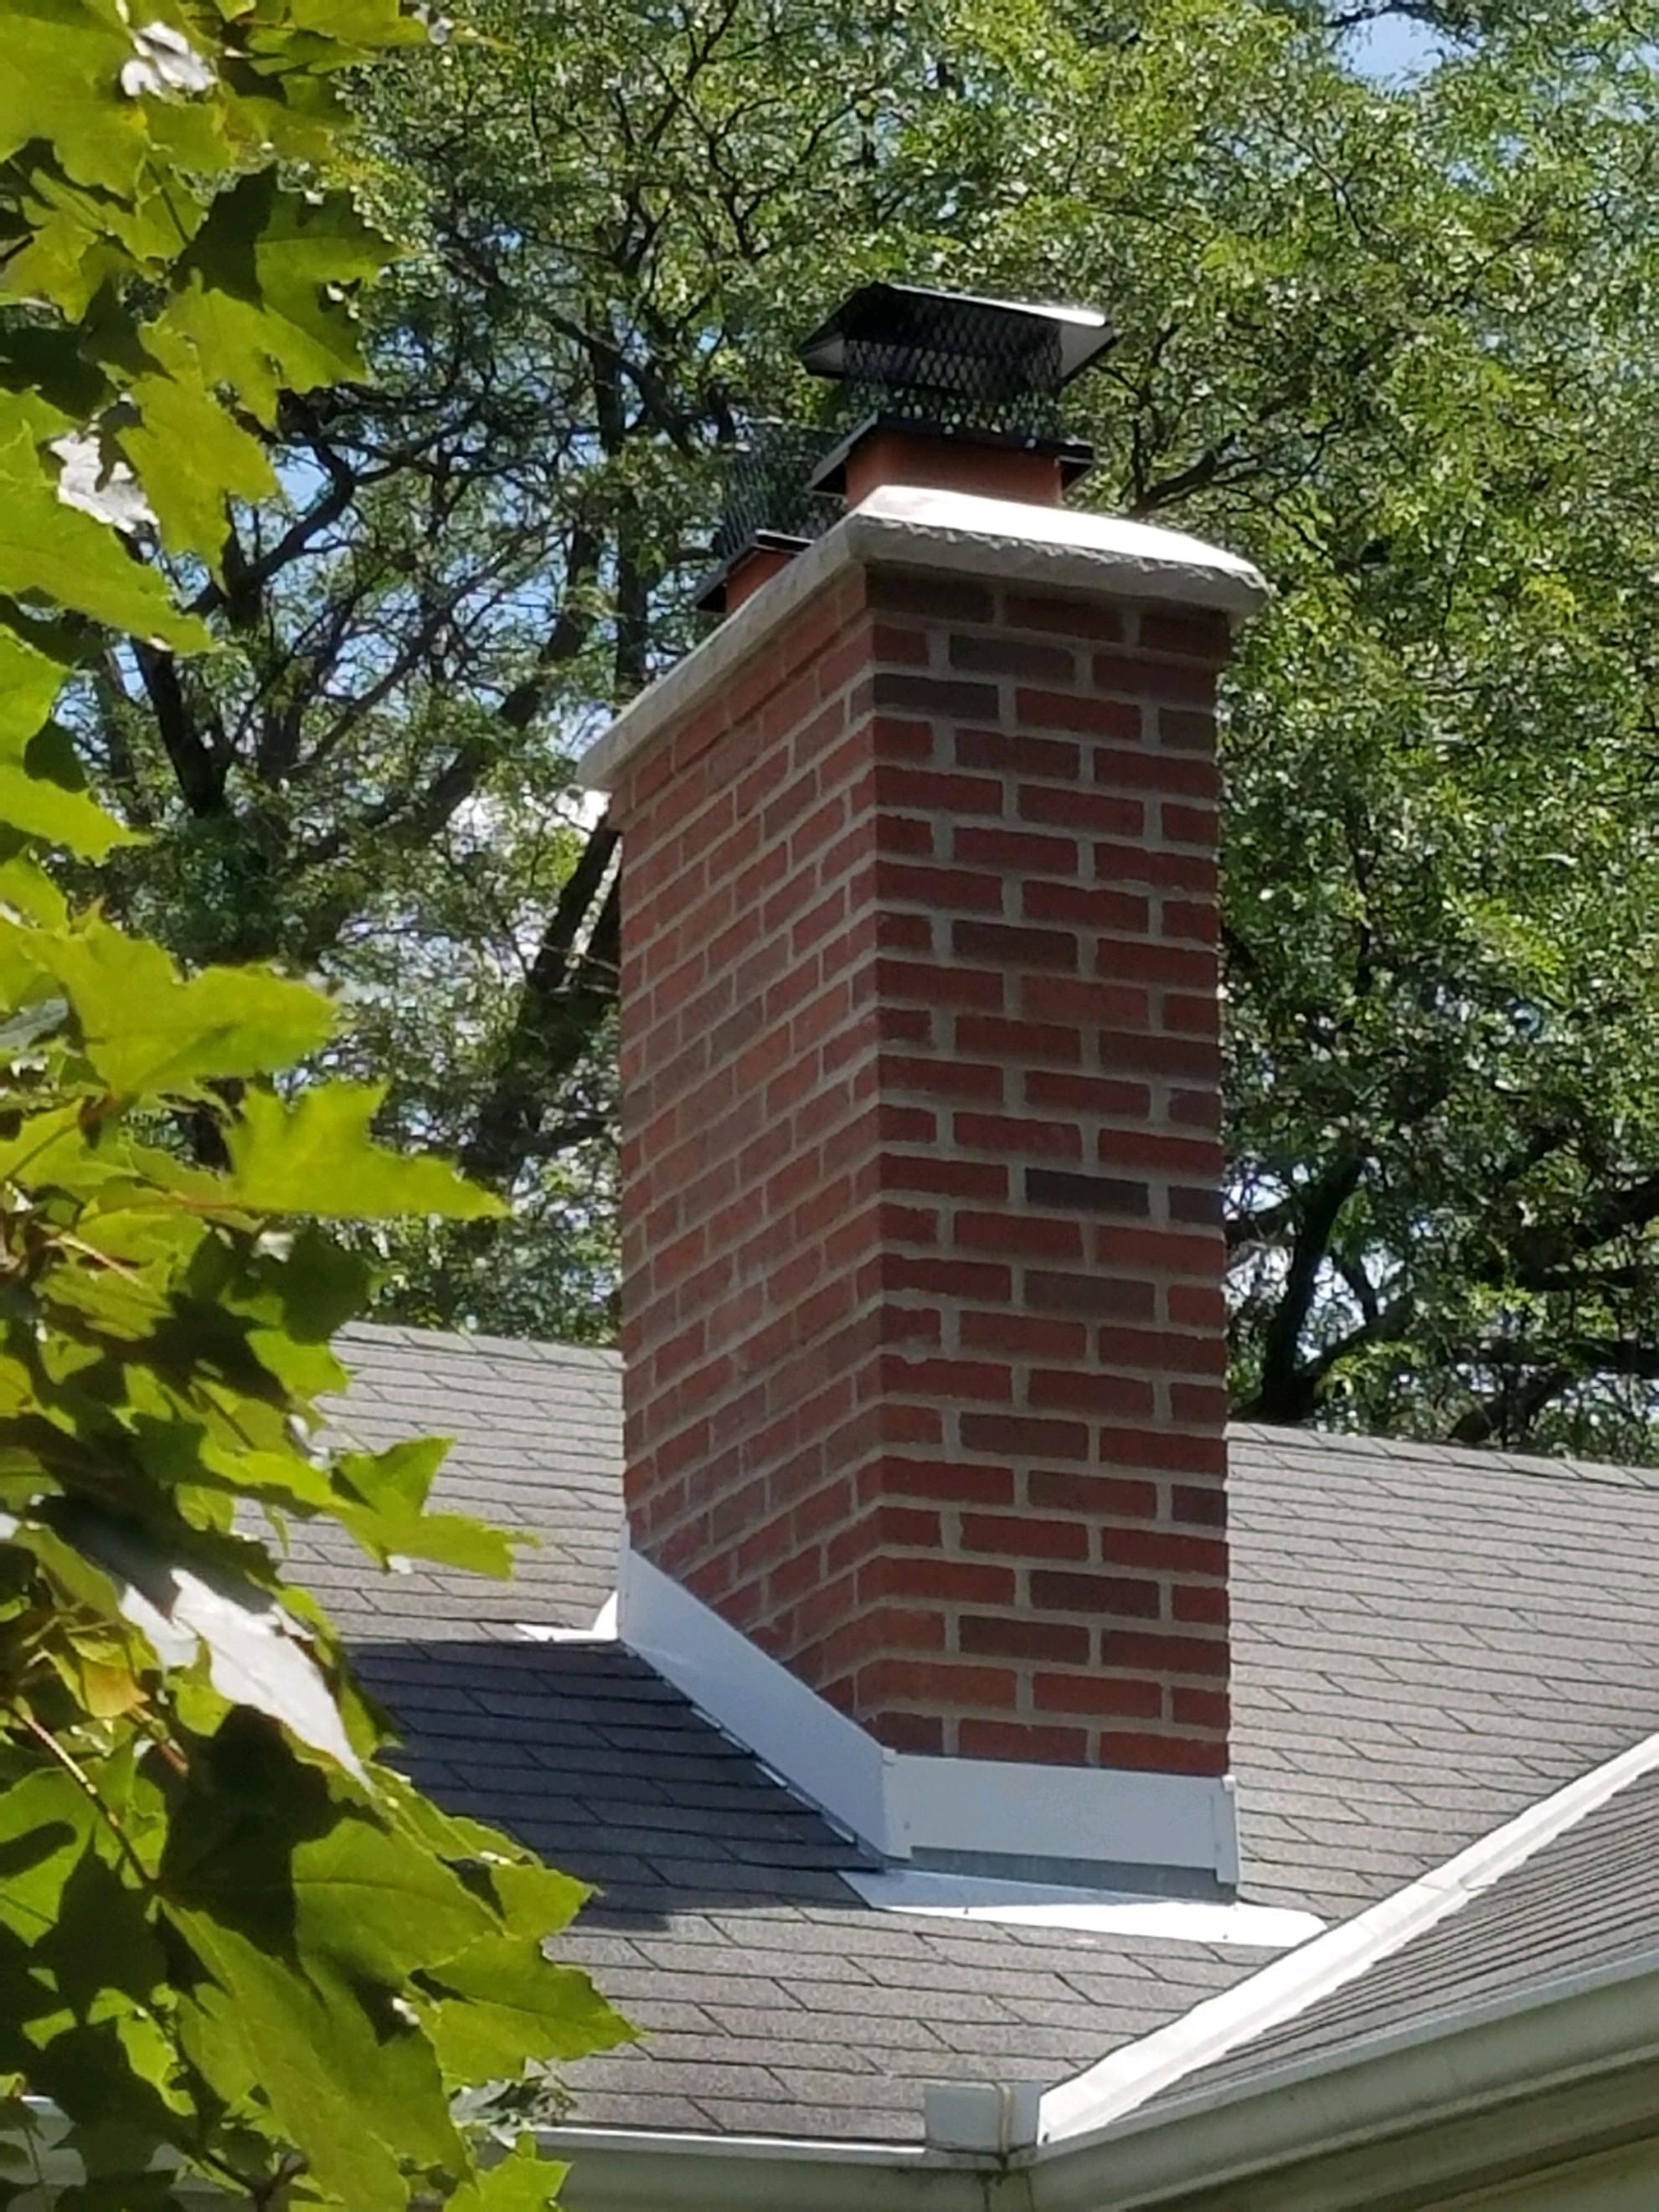 Brick Chimneys (20)